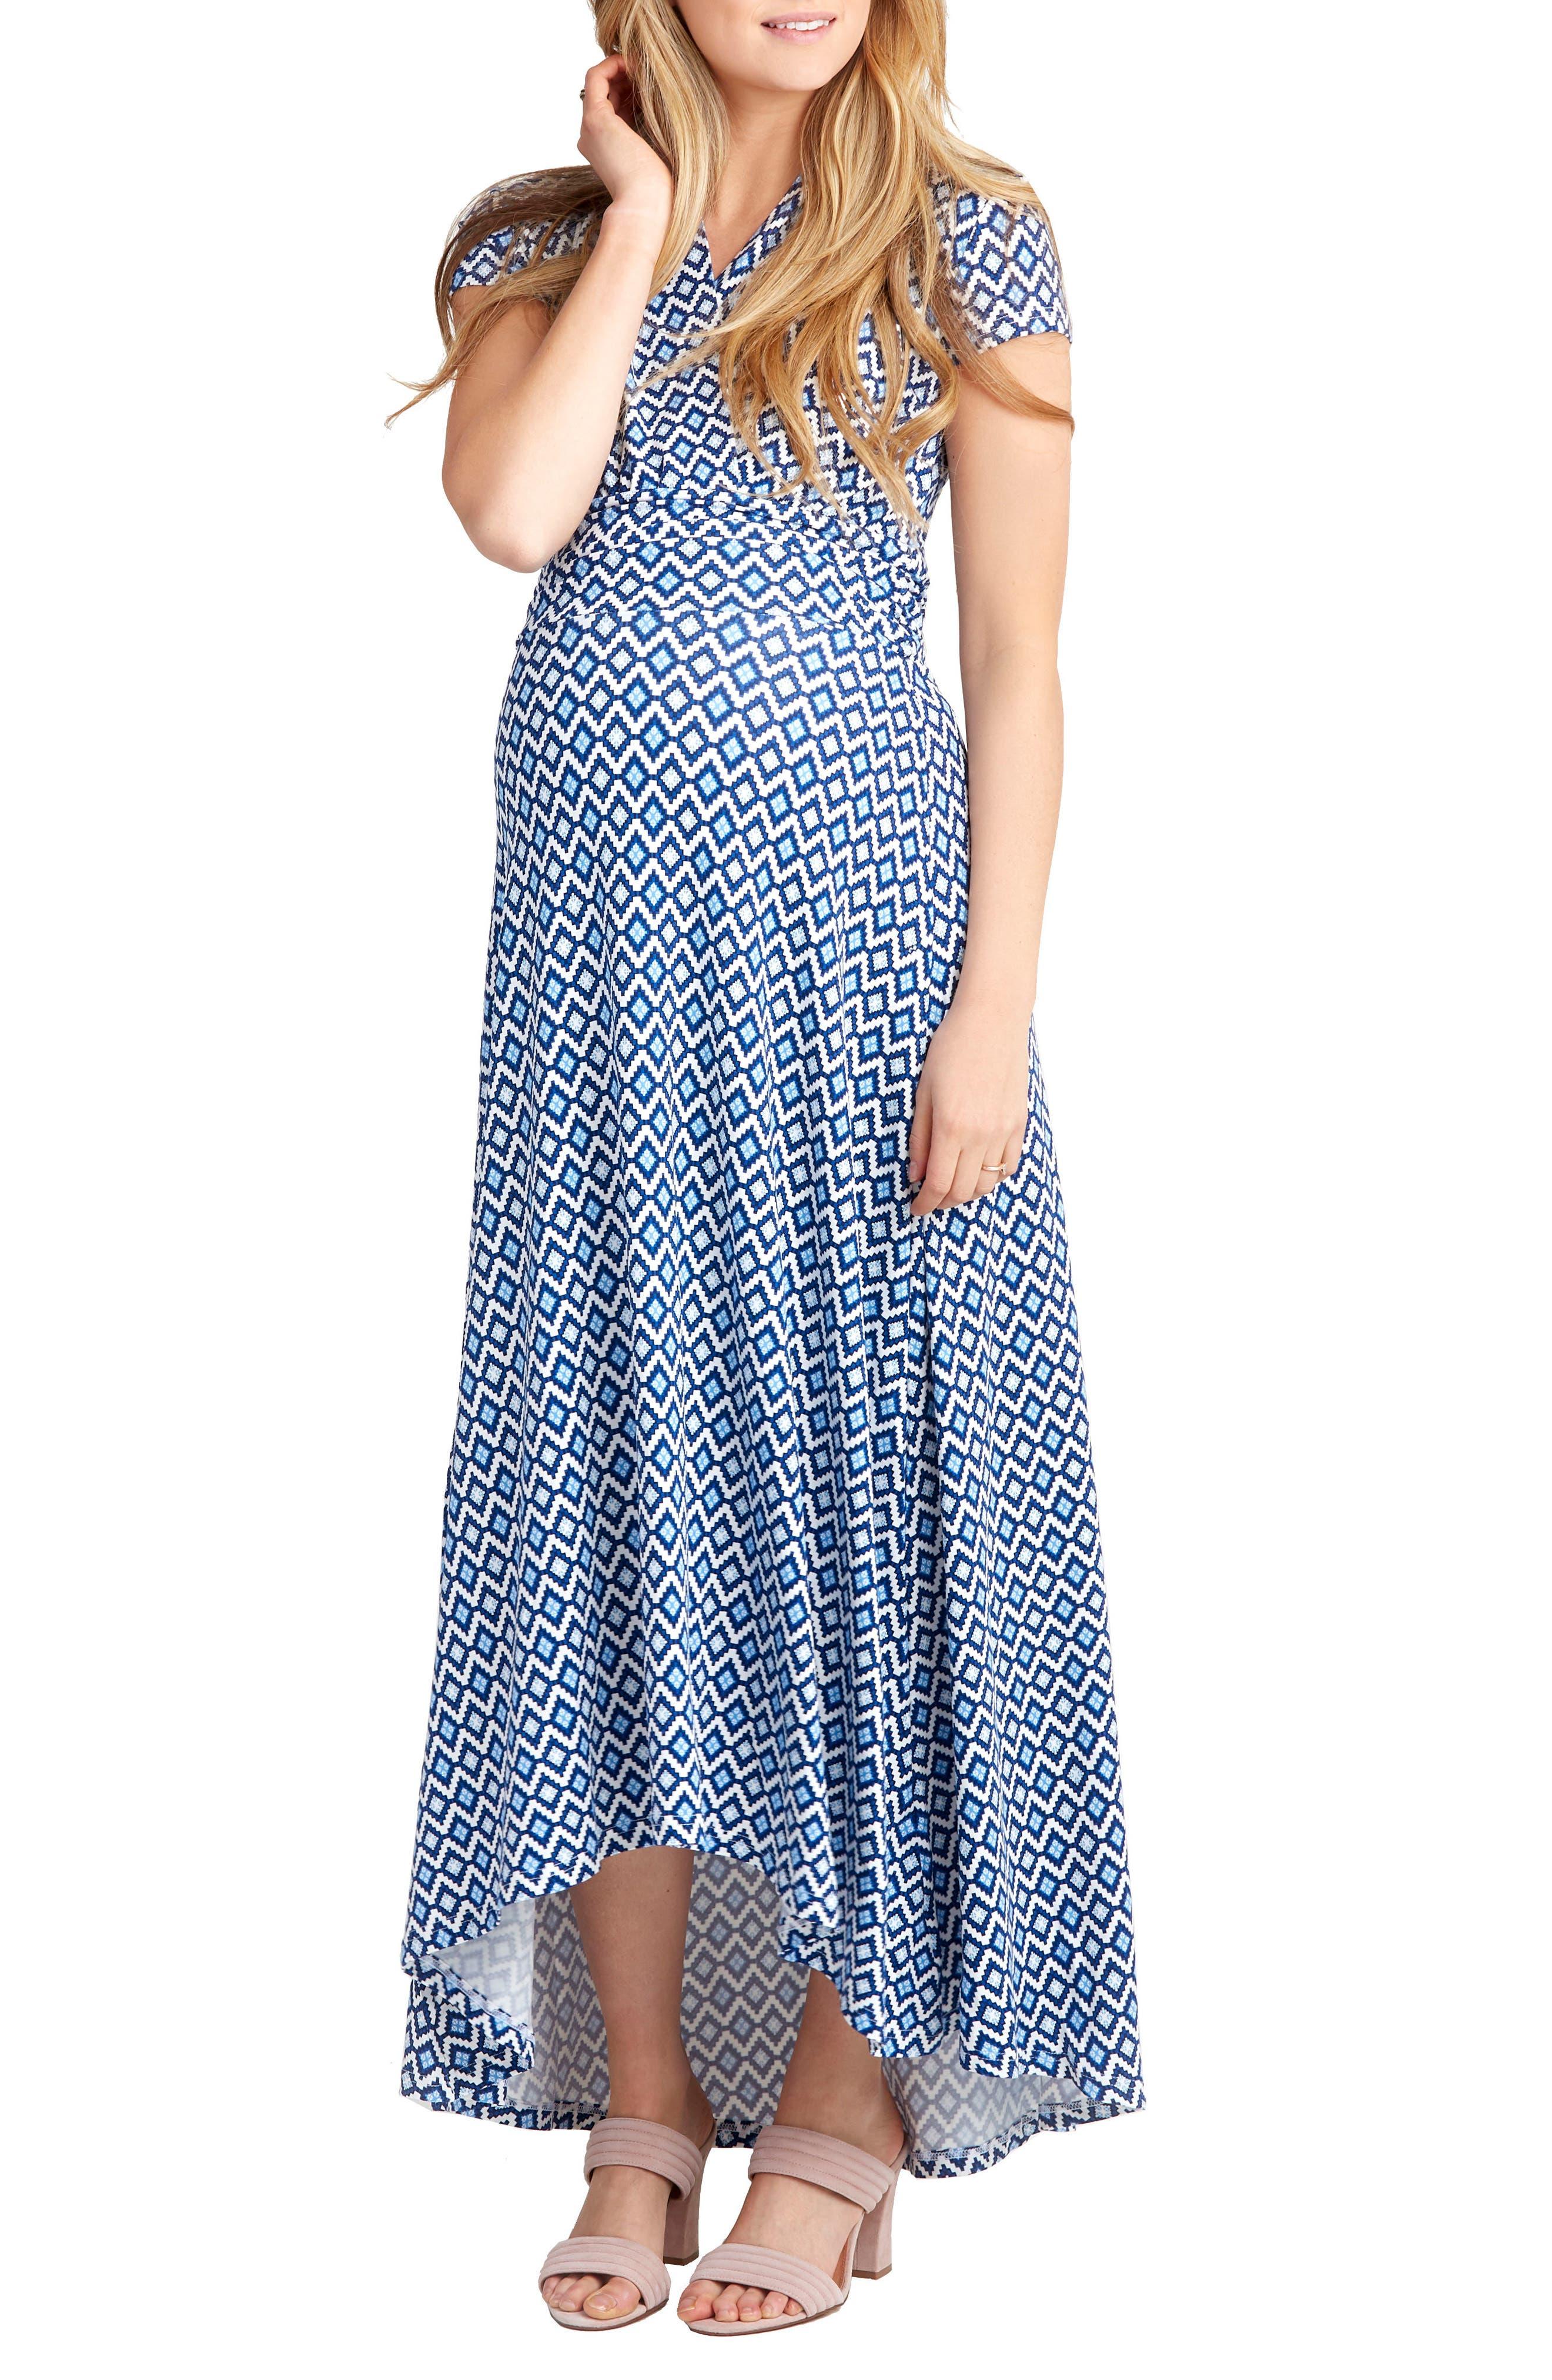 'Caroline' Maternity/Nursing Maxi Dress,                             Main thumbnail 1, color,                             BLUE GEO